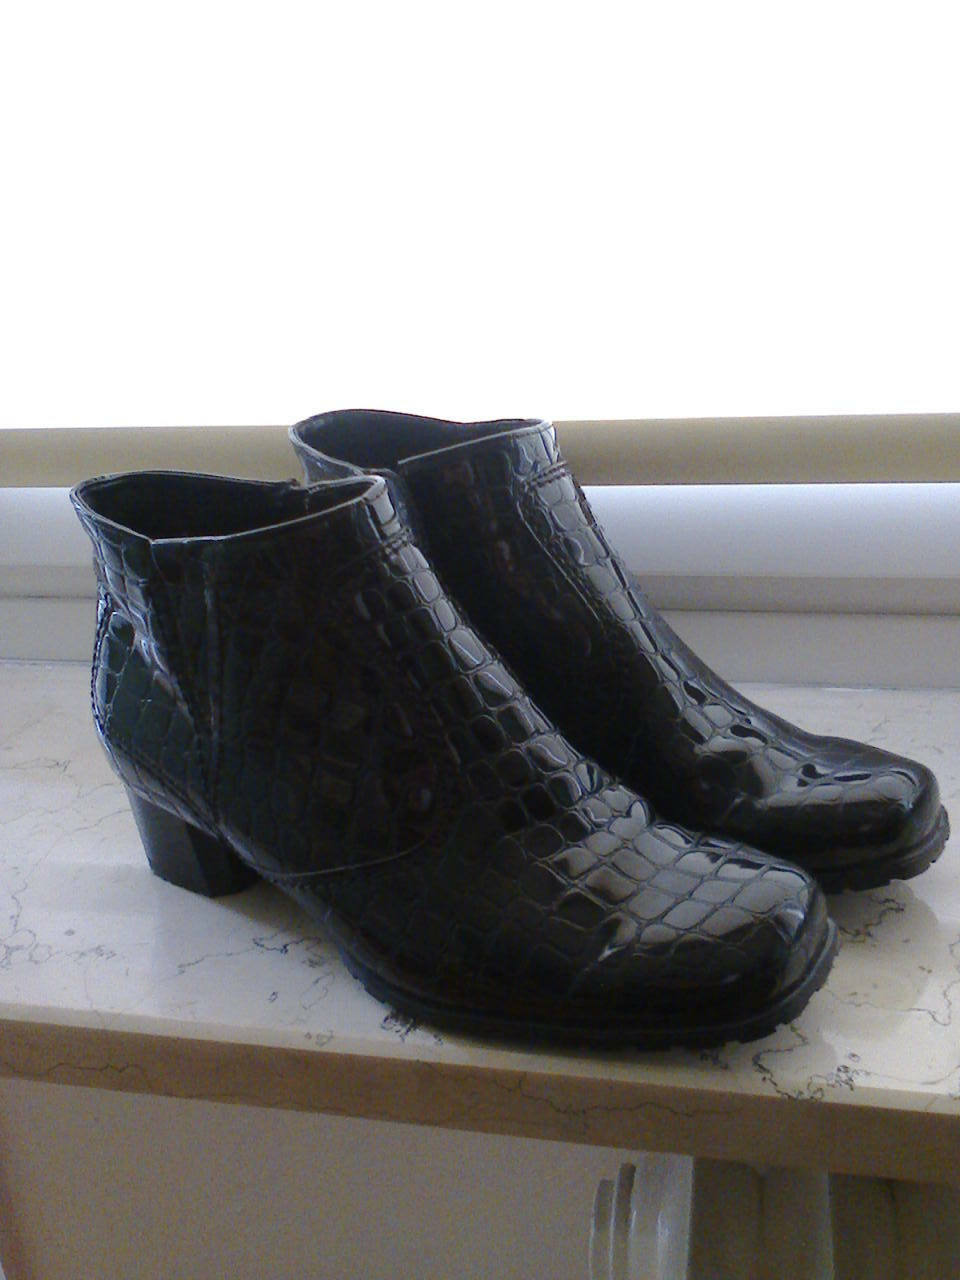 Jenny Damen Stiefeletten Gr. 37, 4 1/2 Lack / Schwarz, Neu kaum getragen